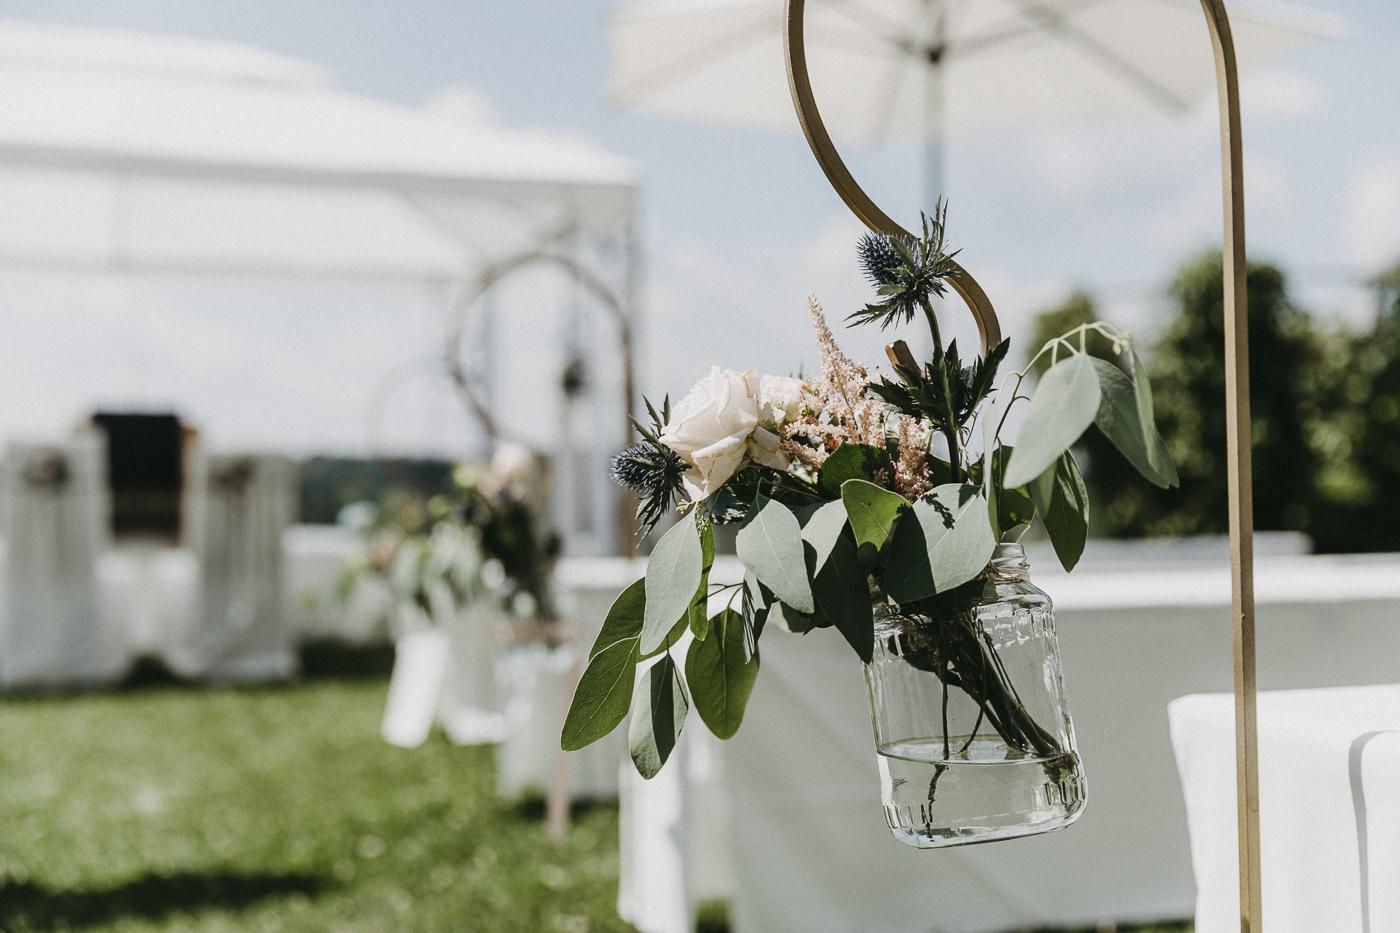 rosemarrylemon_ND_Hochzeit_Hochzeitsplanung13.jpg